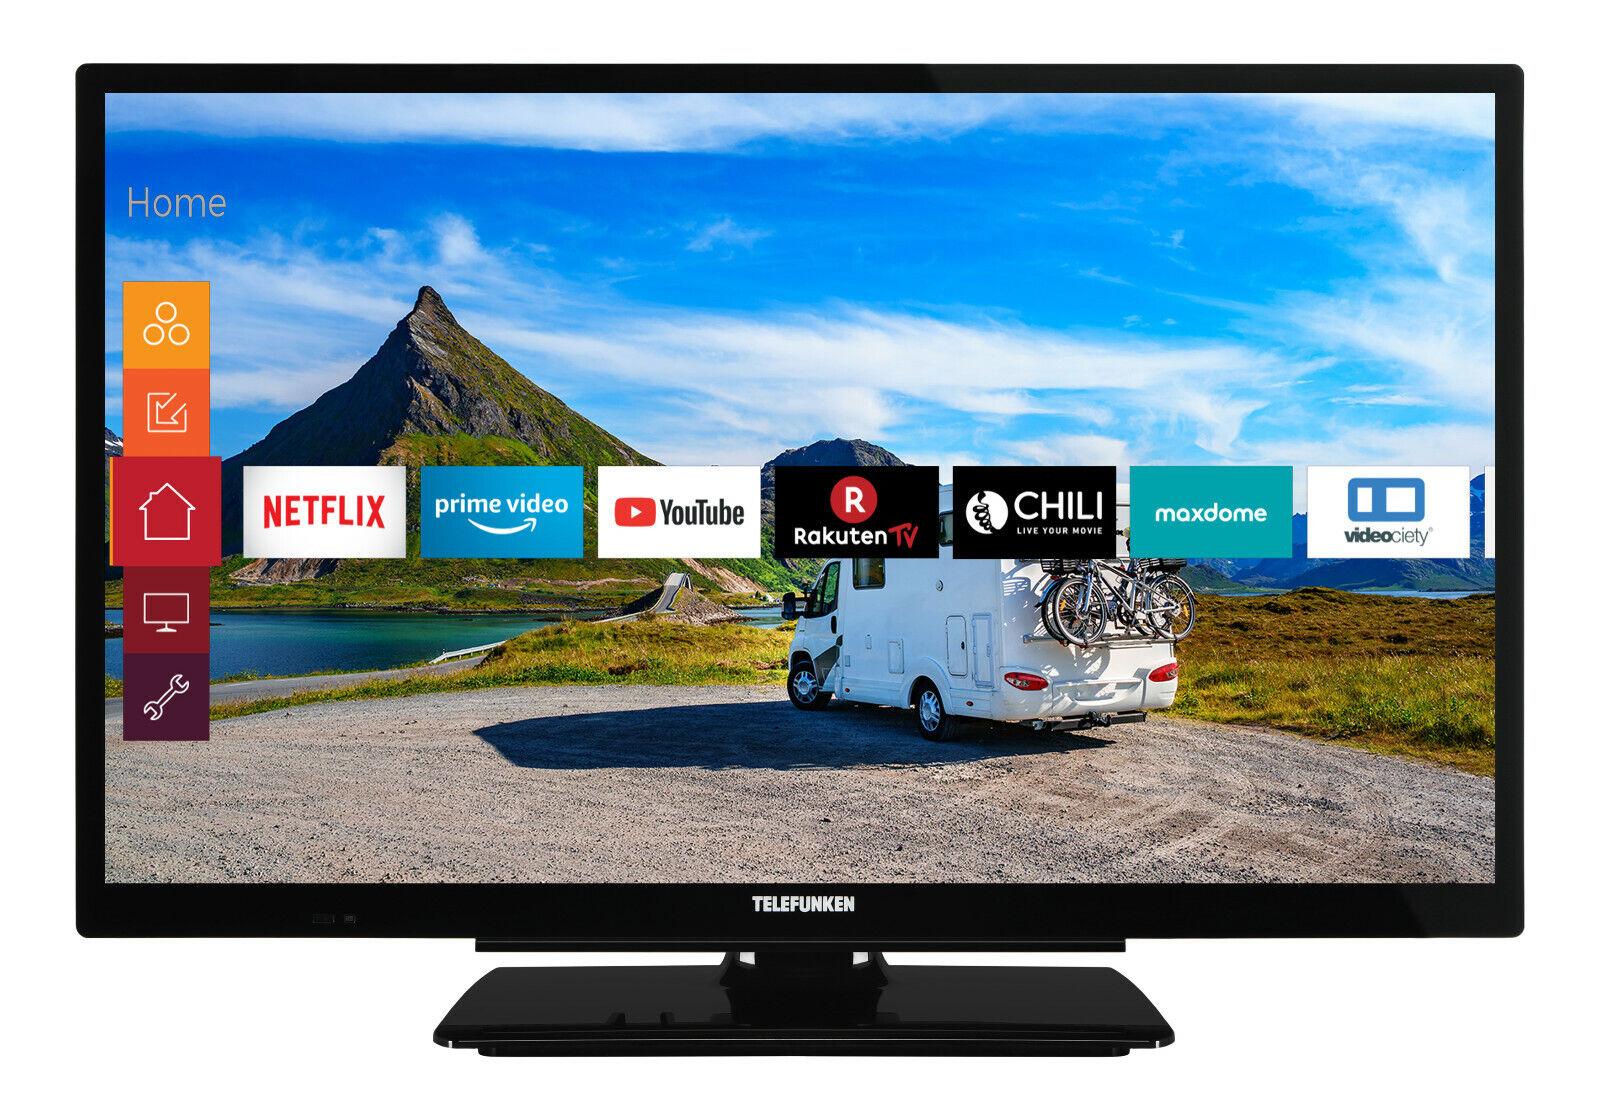 Telefunken XF22G501V Fernseher 22 Zoll Full HD Smart TV 12 Volt Works with Alexa